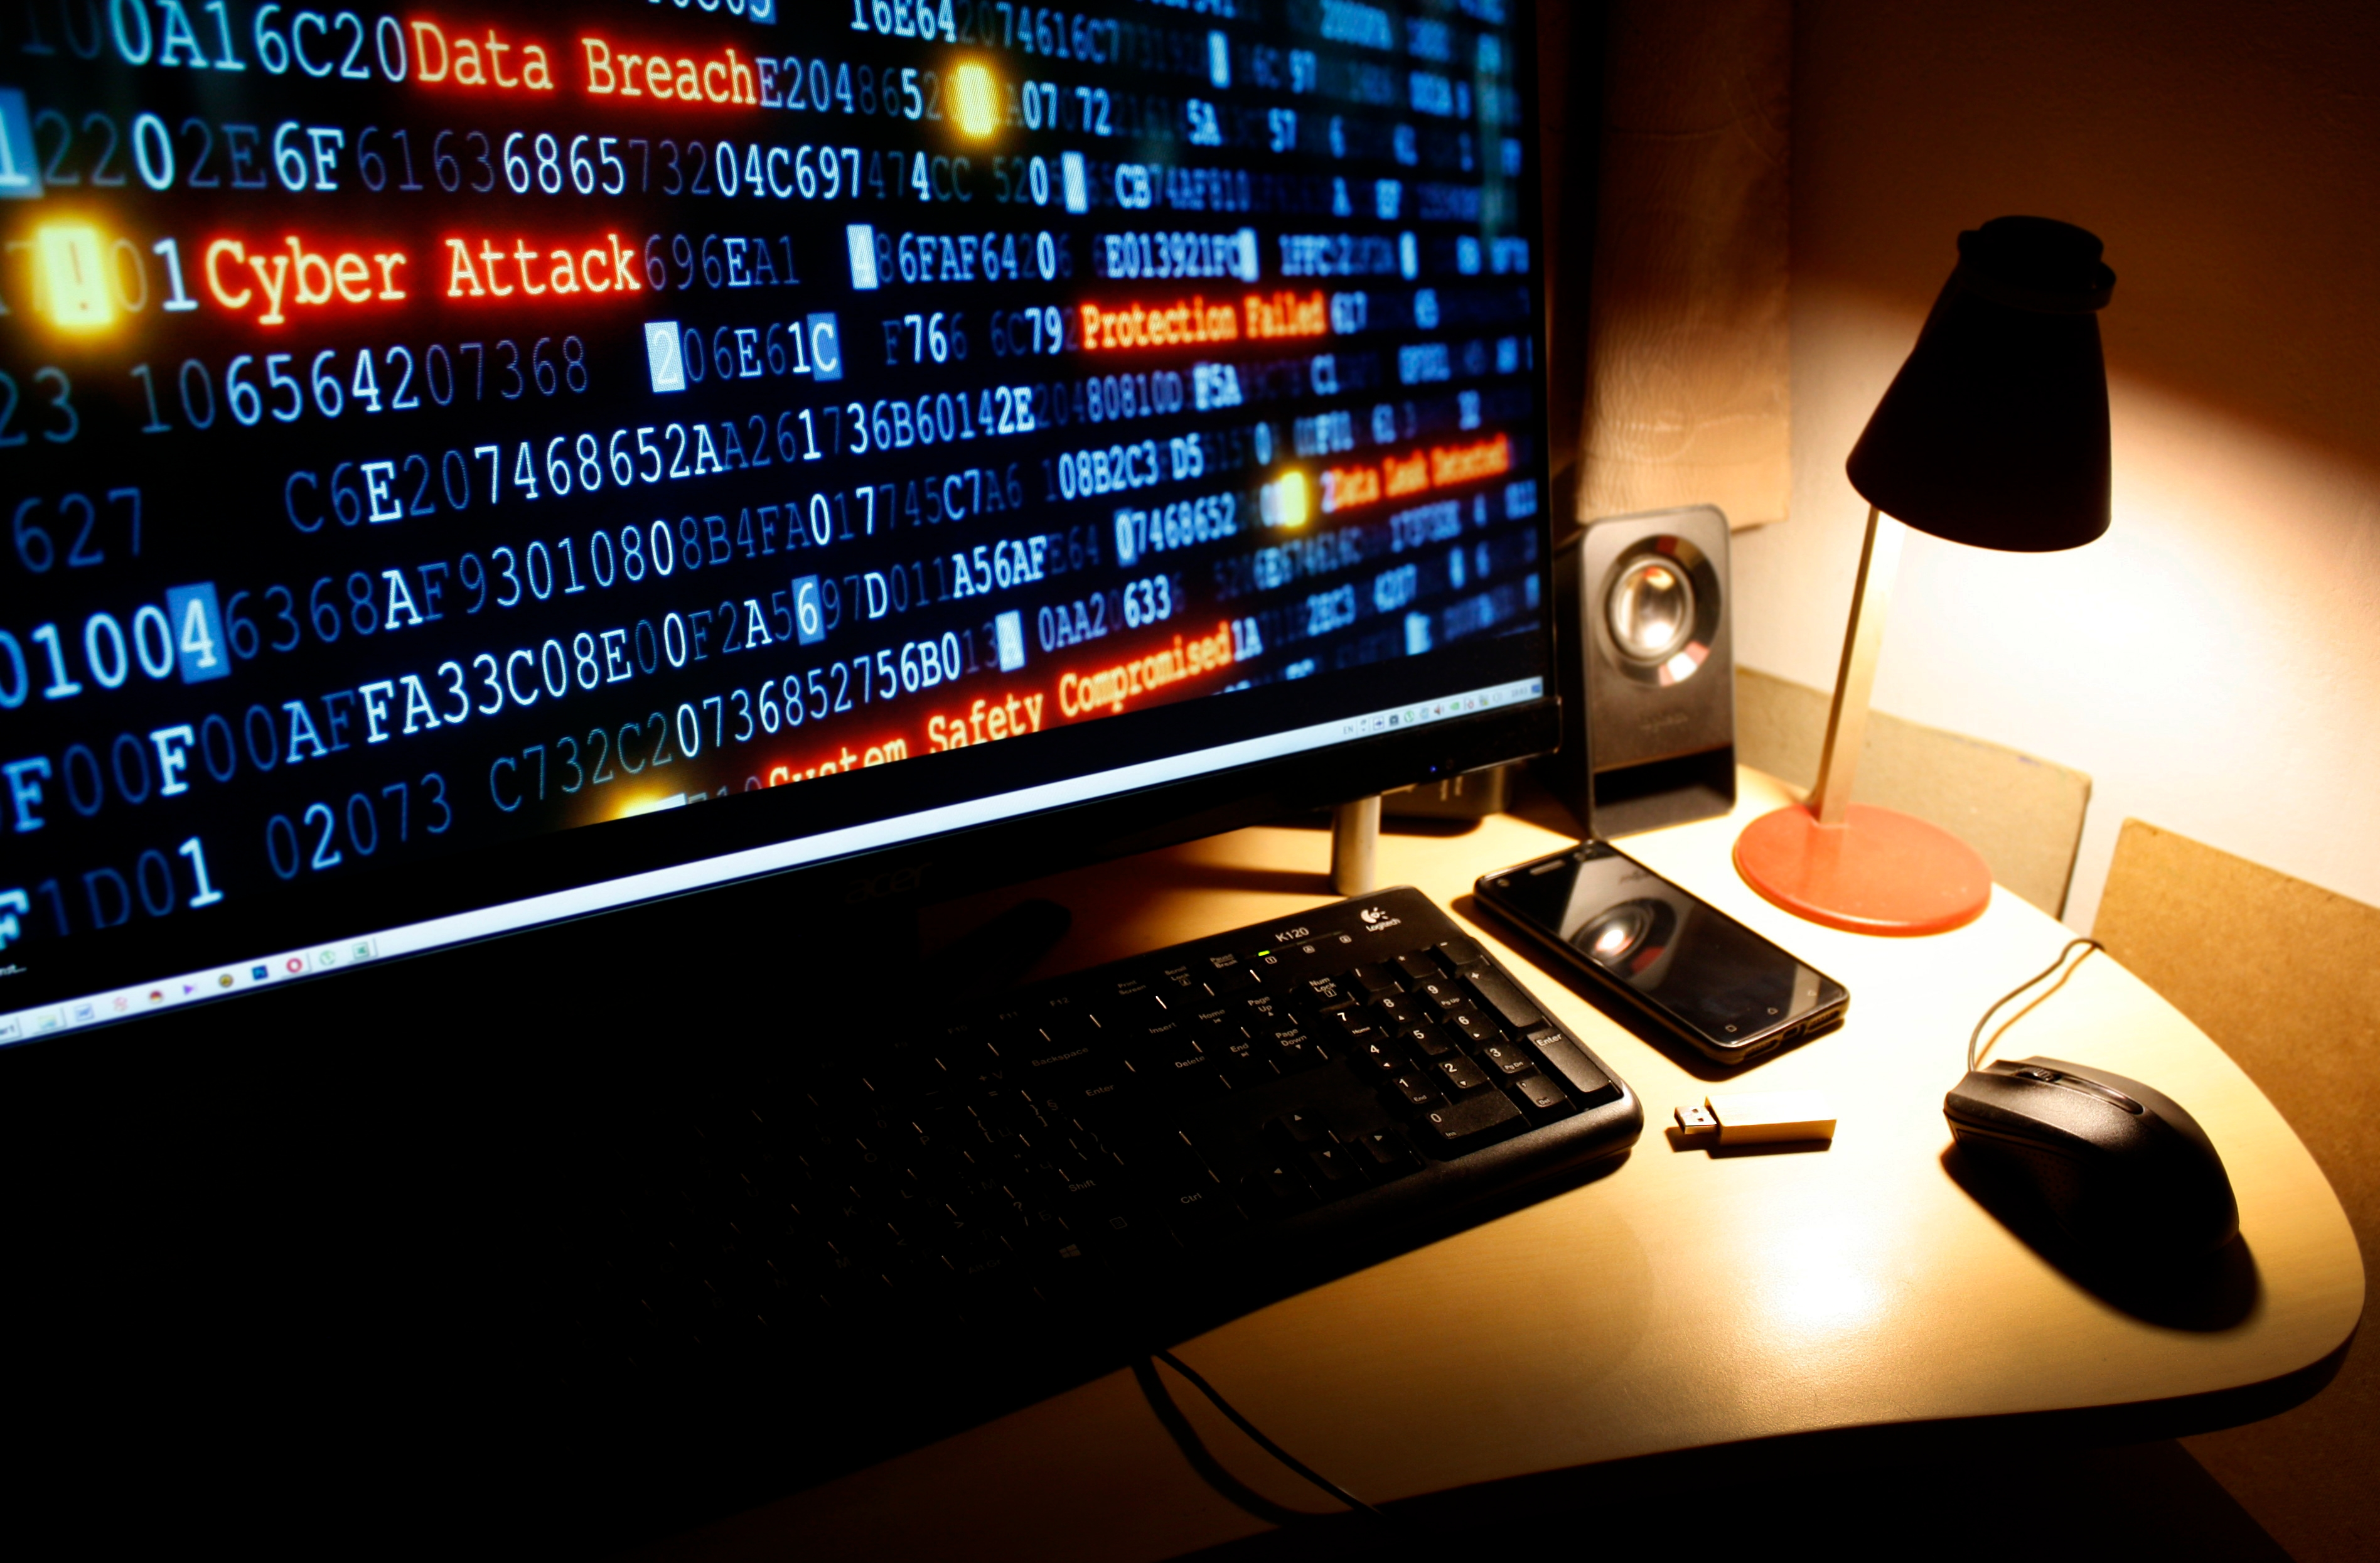 cyber-crime-cyber-attack-hacking-computer-deskt-2021-04-05-01-16-41-utc